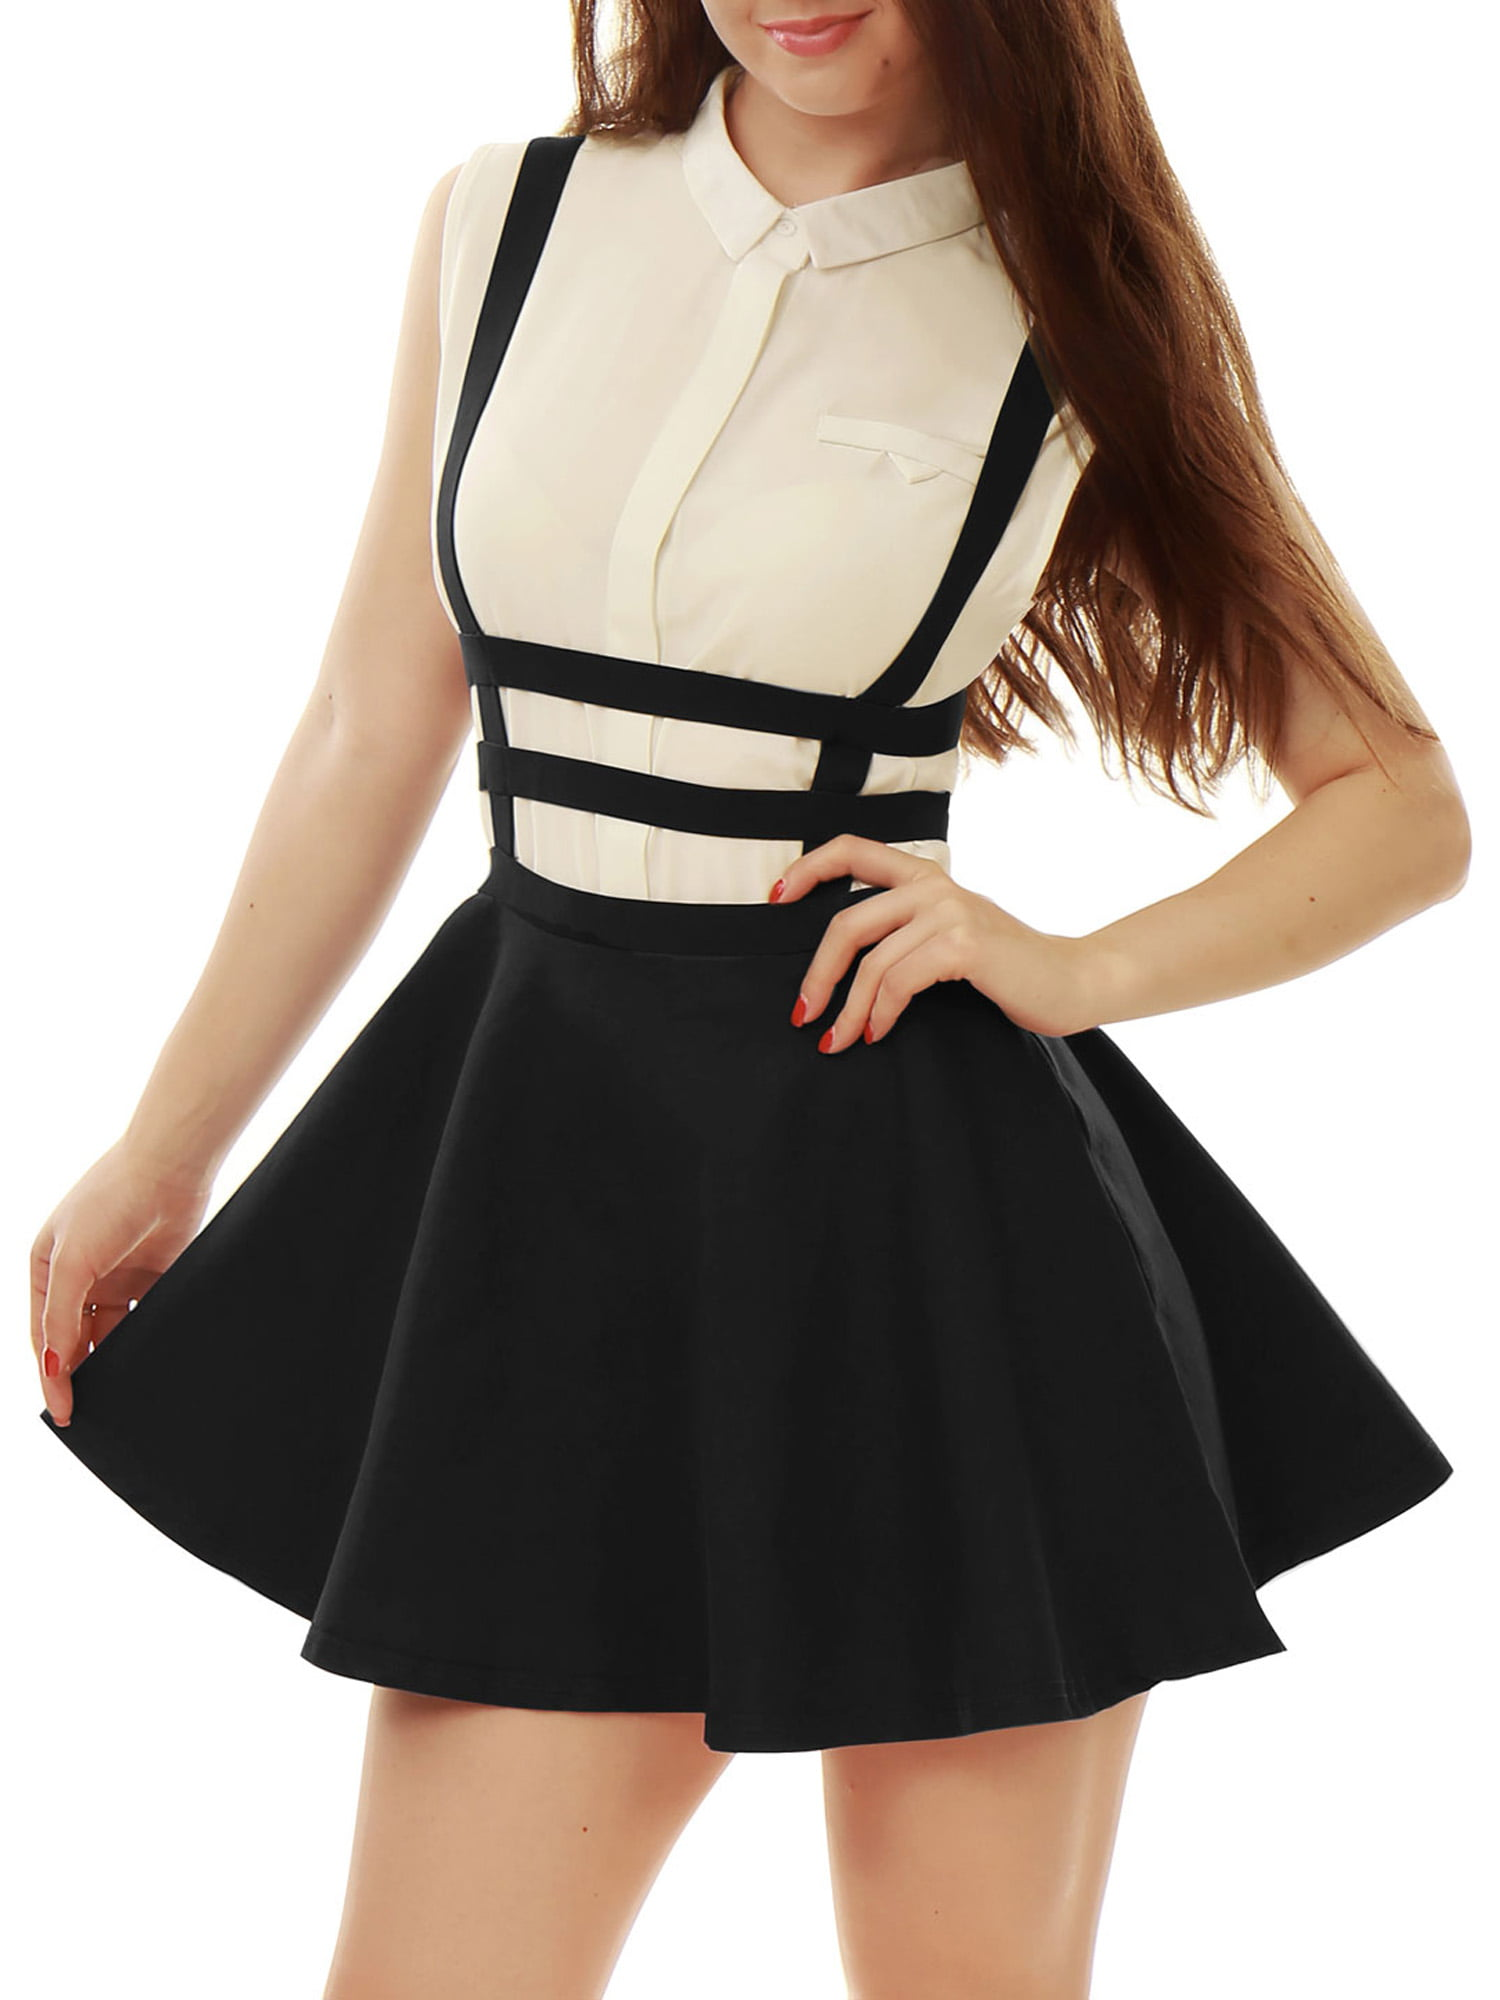 Bubble but mini skirts Allegra K Women S Strappy Short Skirts Black Size L 12 Walmart Com Walmart Com